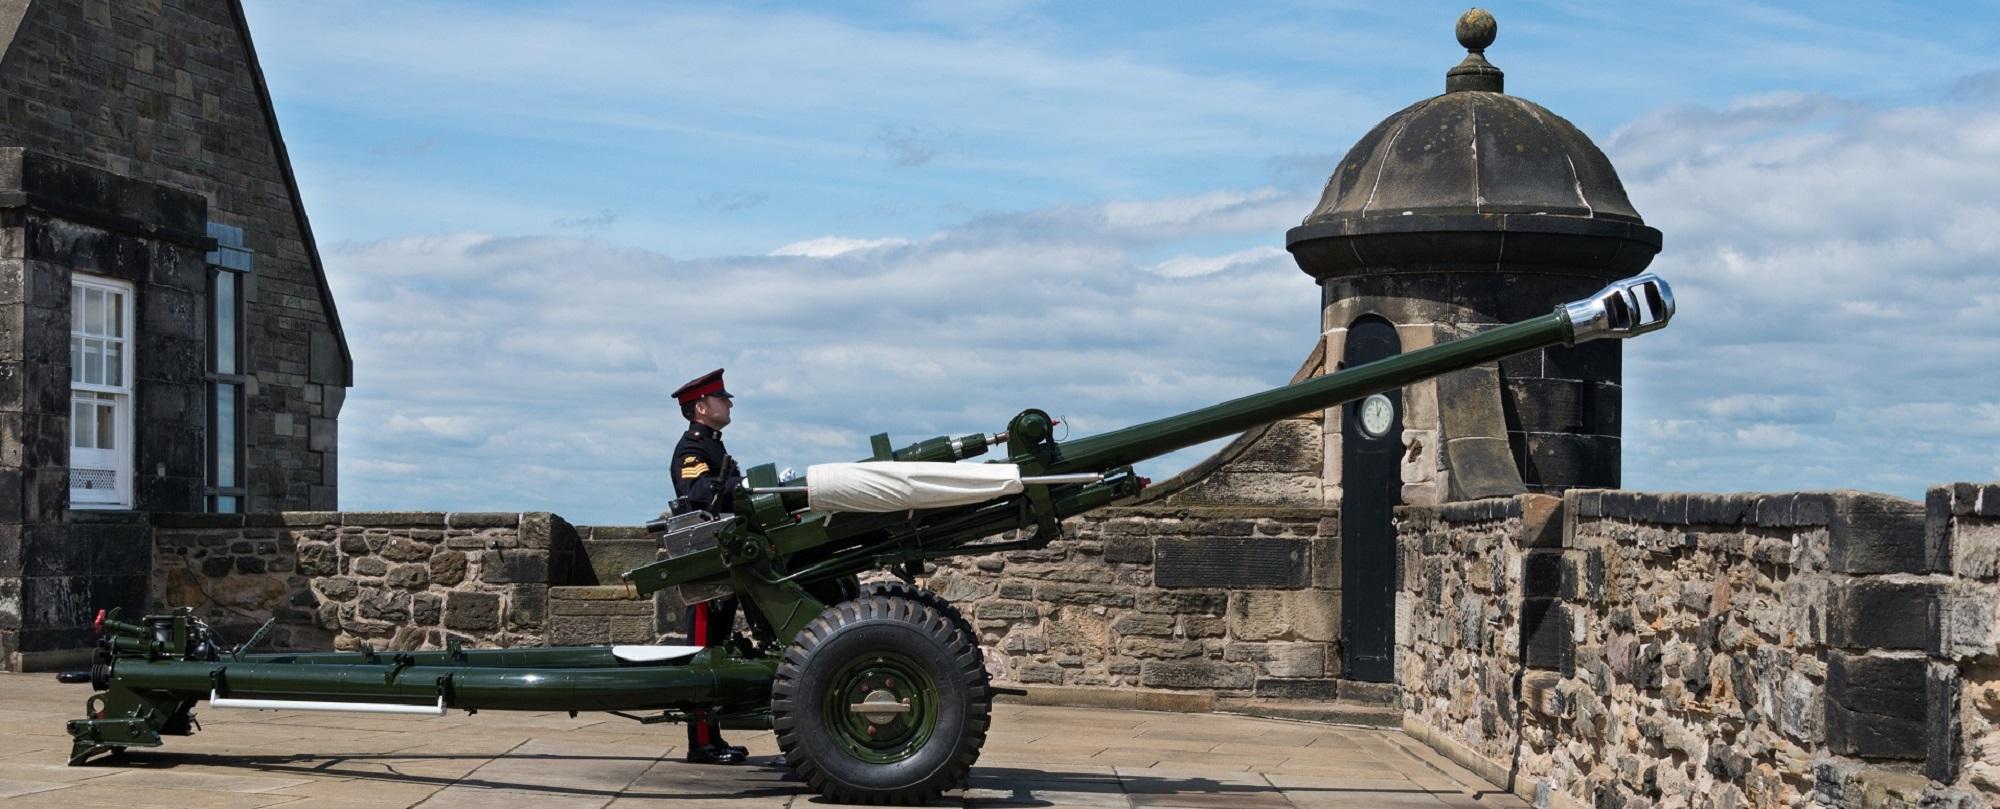 A soldier preparing to fire the One O'Clock gun at Edinburgh Castle